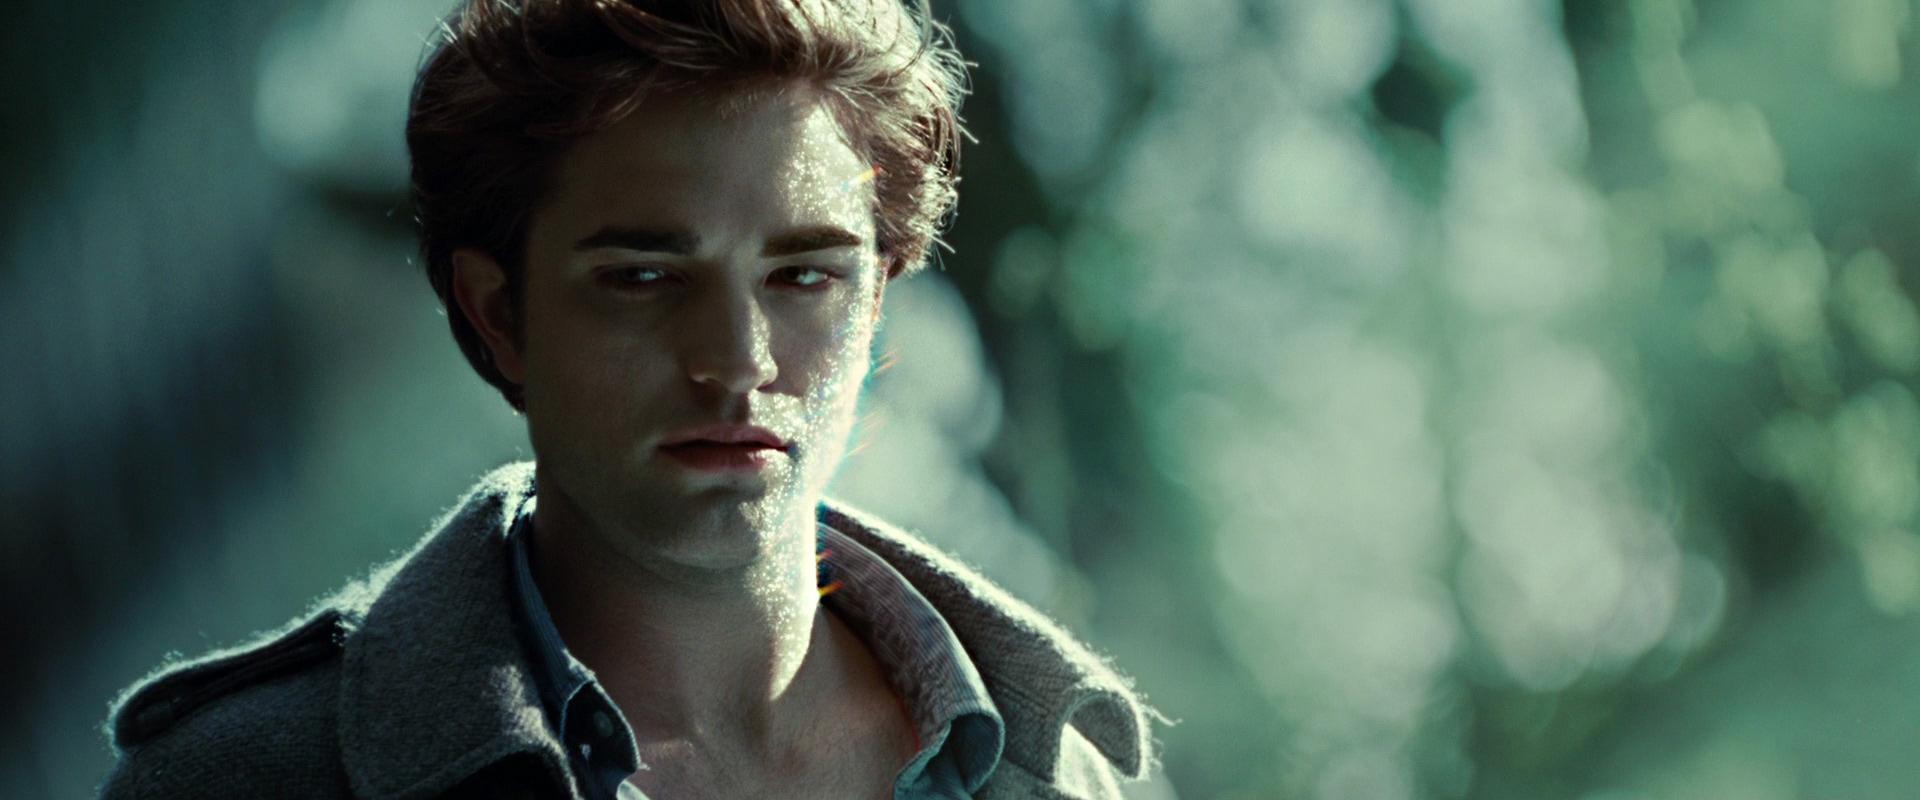 вампир Эдвард в лучах солнца